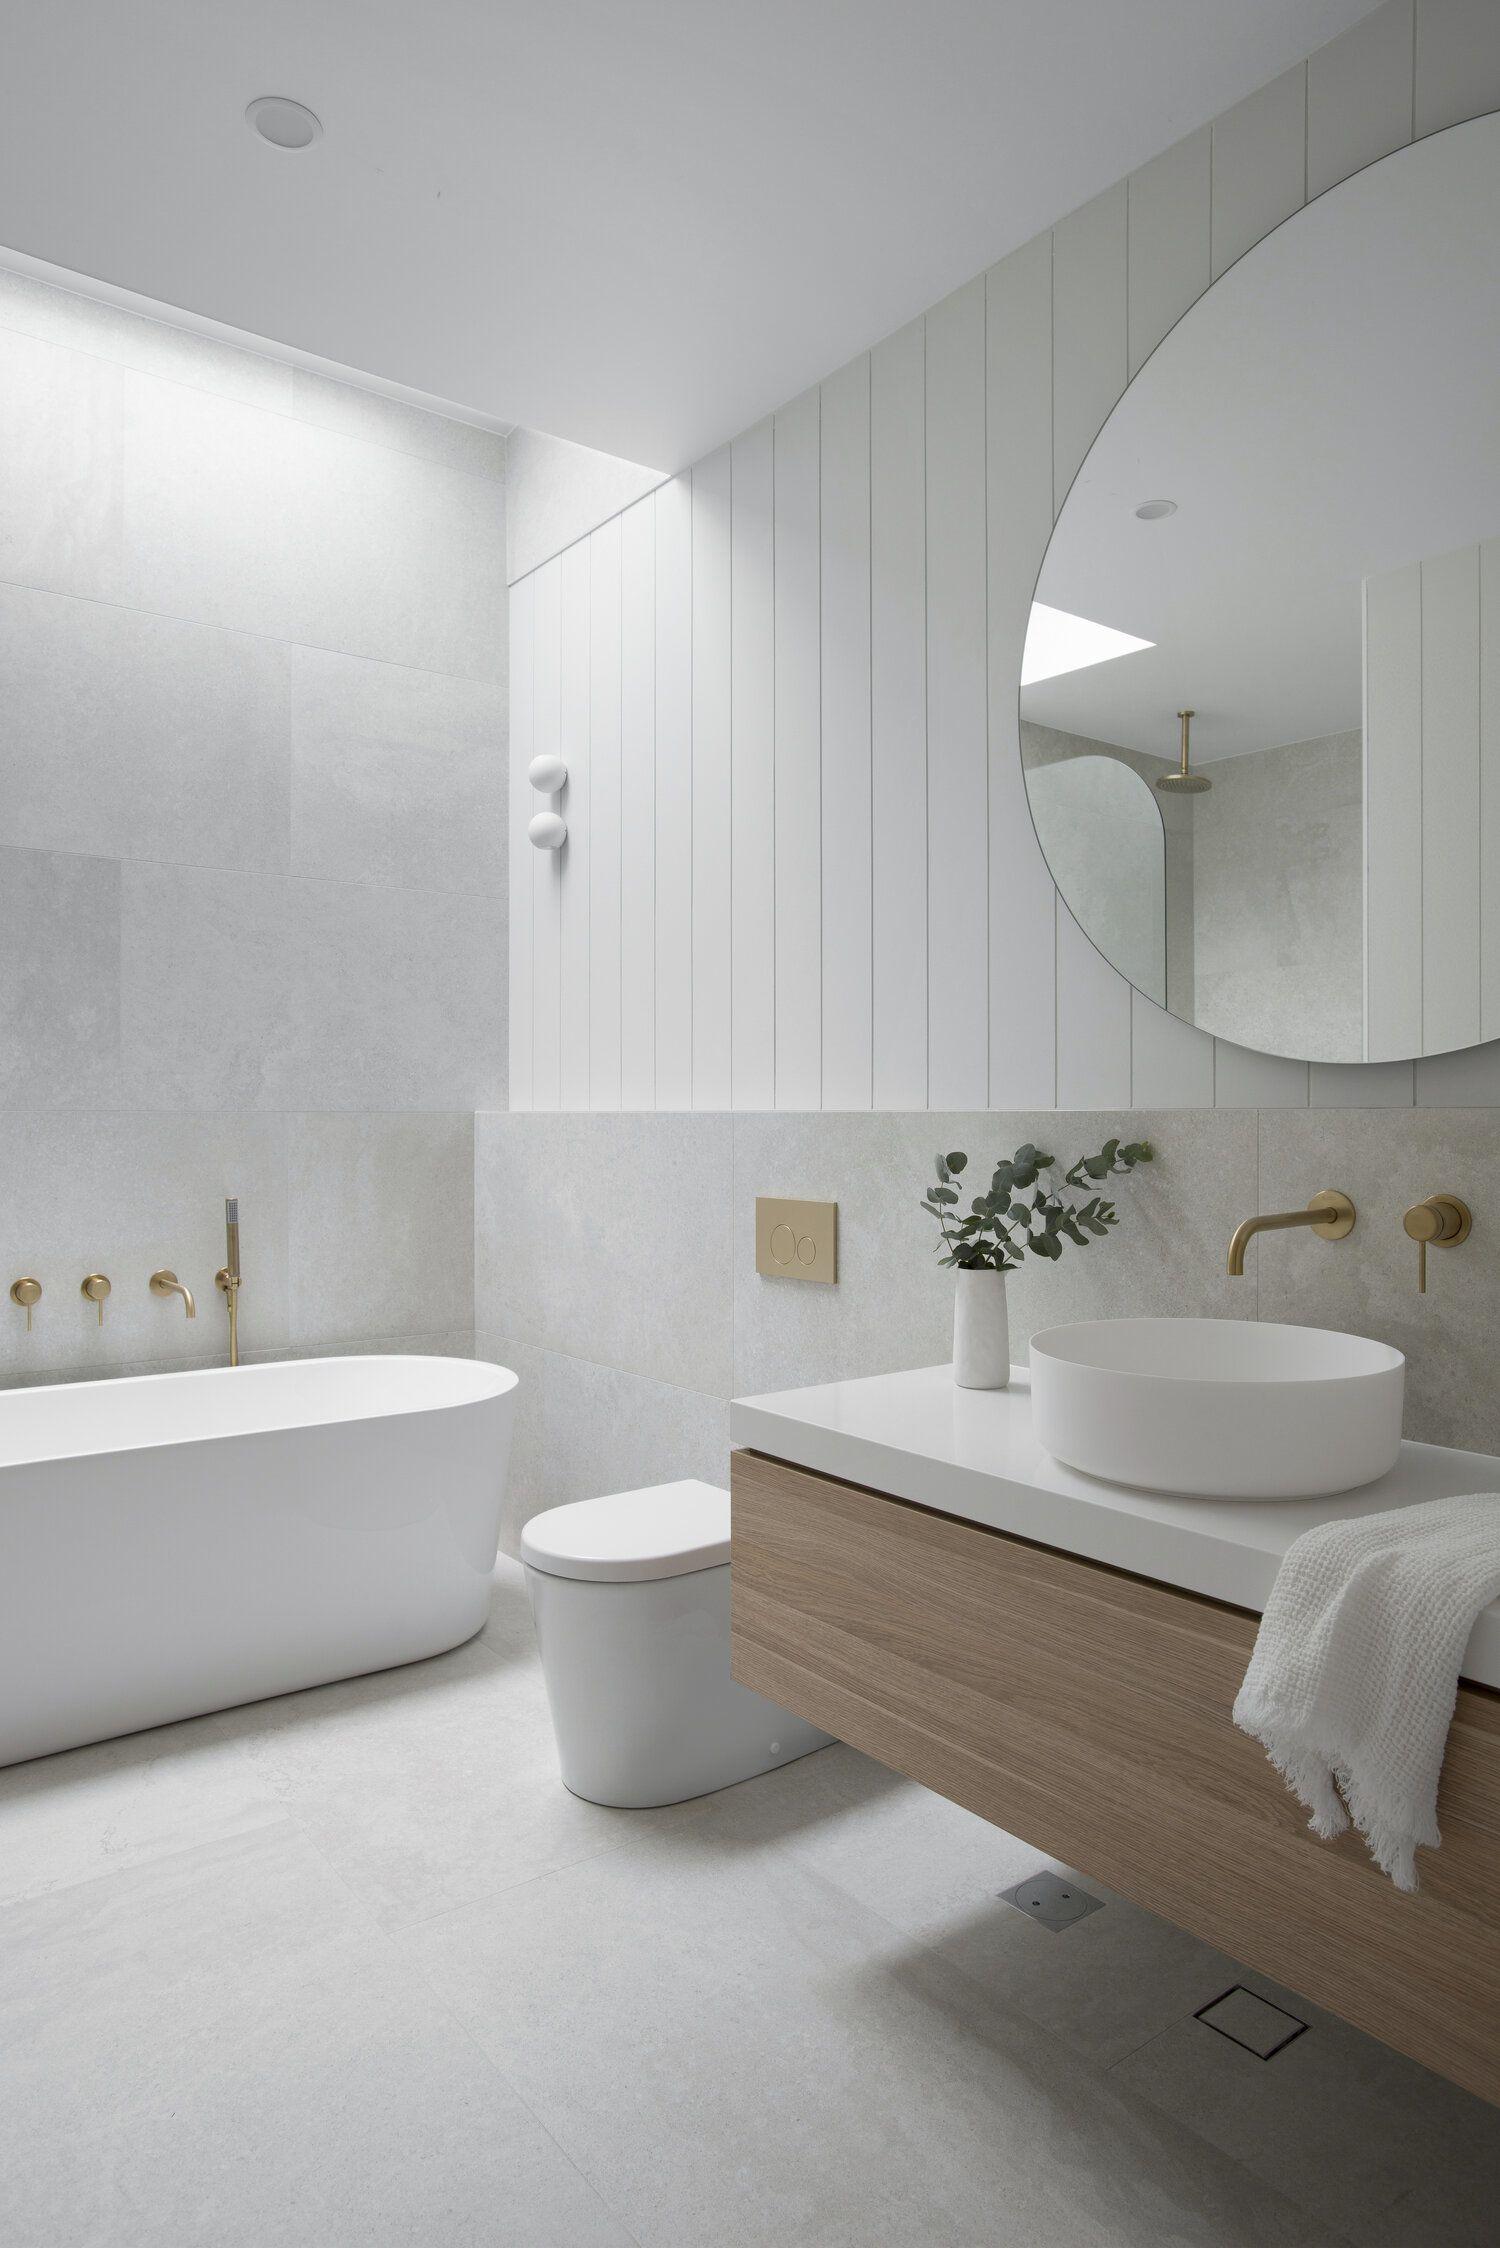 Classic Coastal Bathroom Colour Scheme Zephyr Stone In 2020 Bathroom Color Schemes Bathroom Interior Design Bathroom Interior